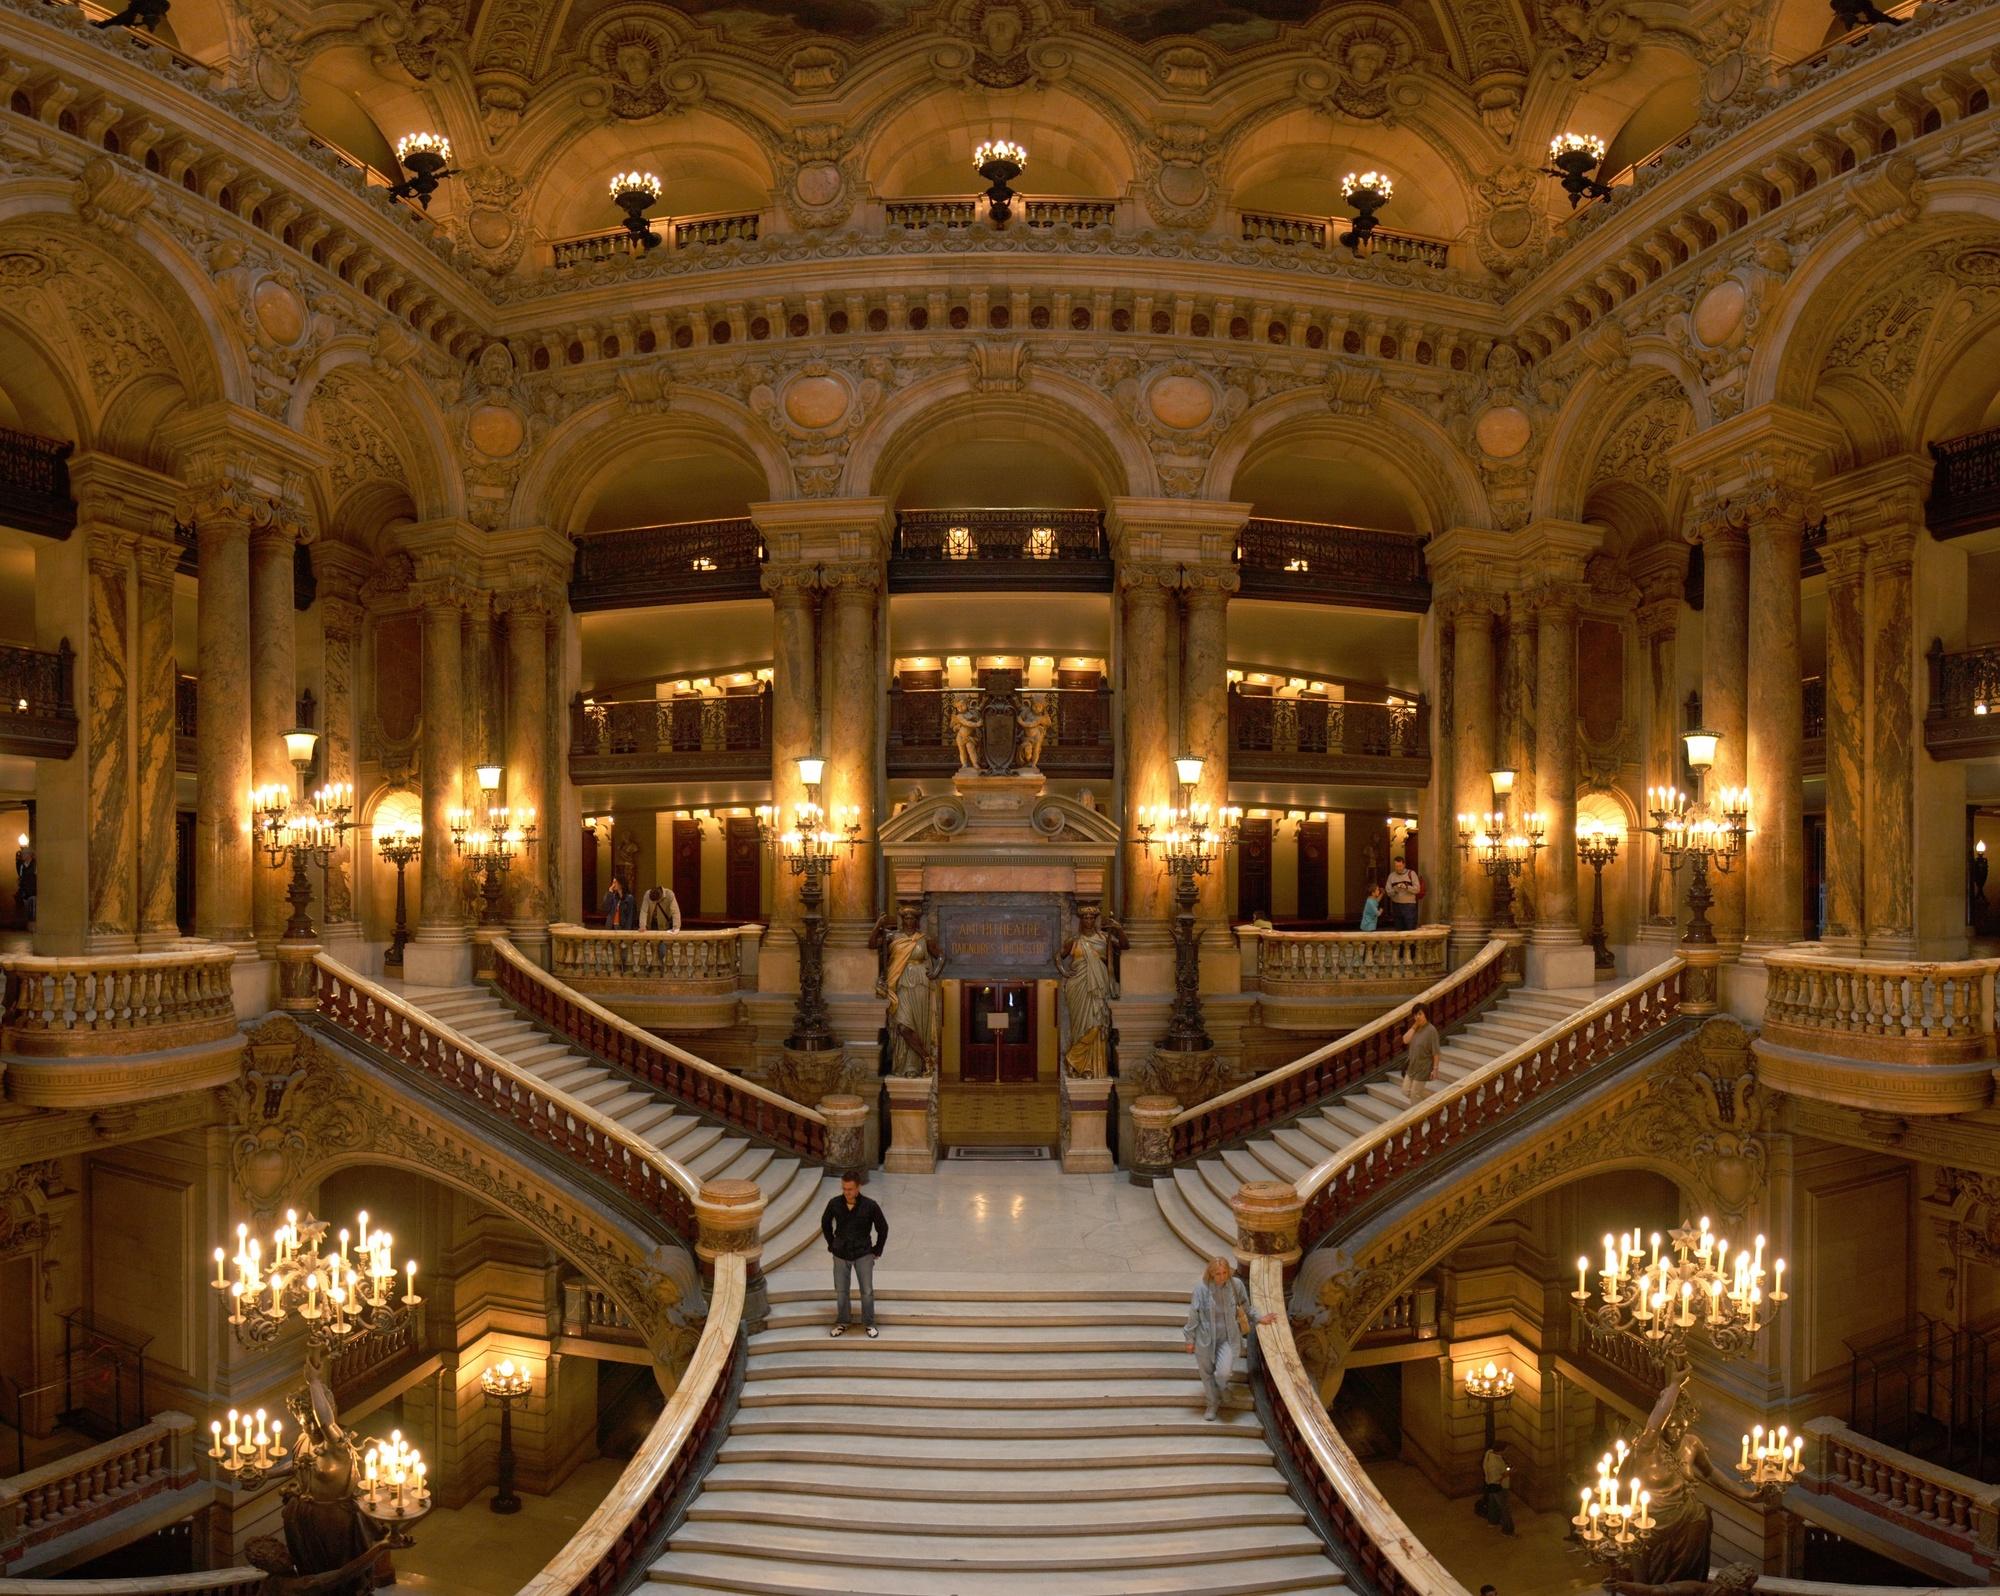 Opera_Garnier_Grand_Escalier_Paris_France